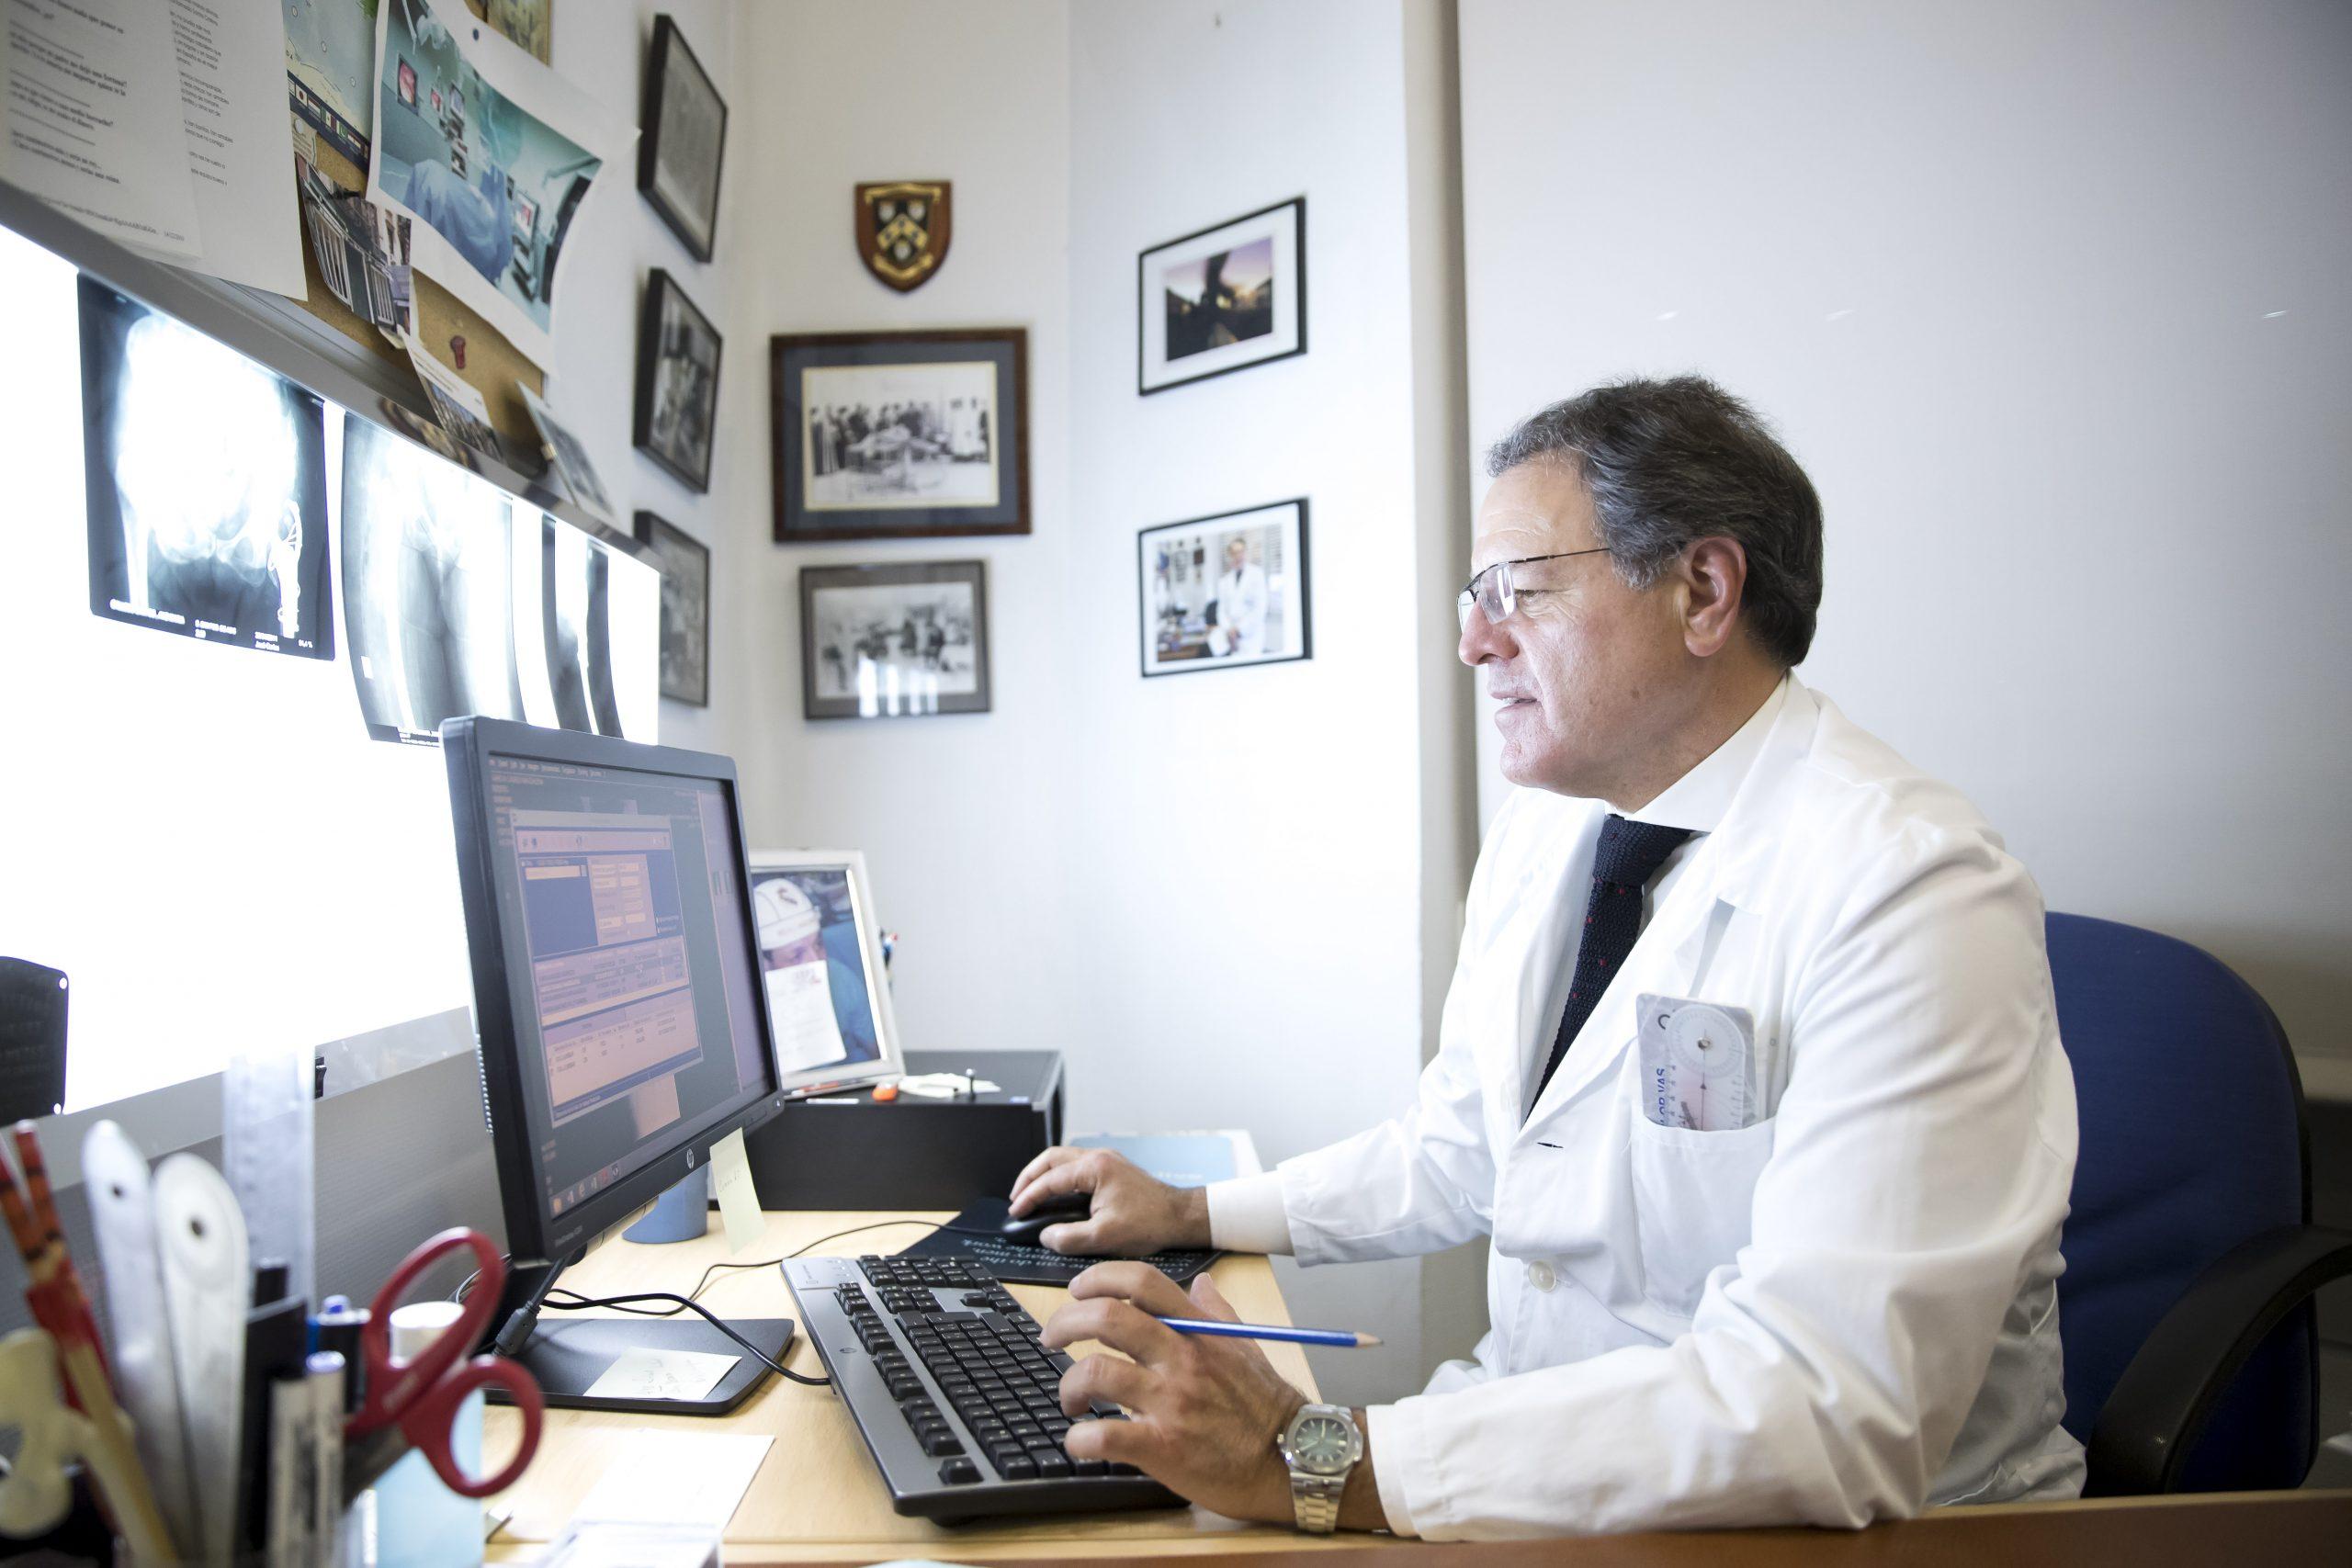 Dr. Llpis Contacto